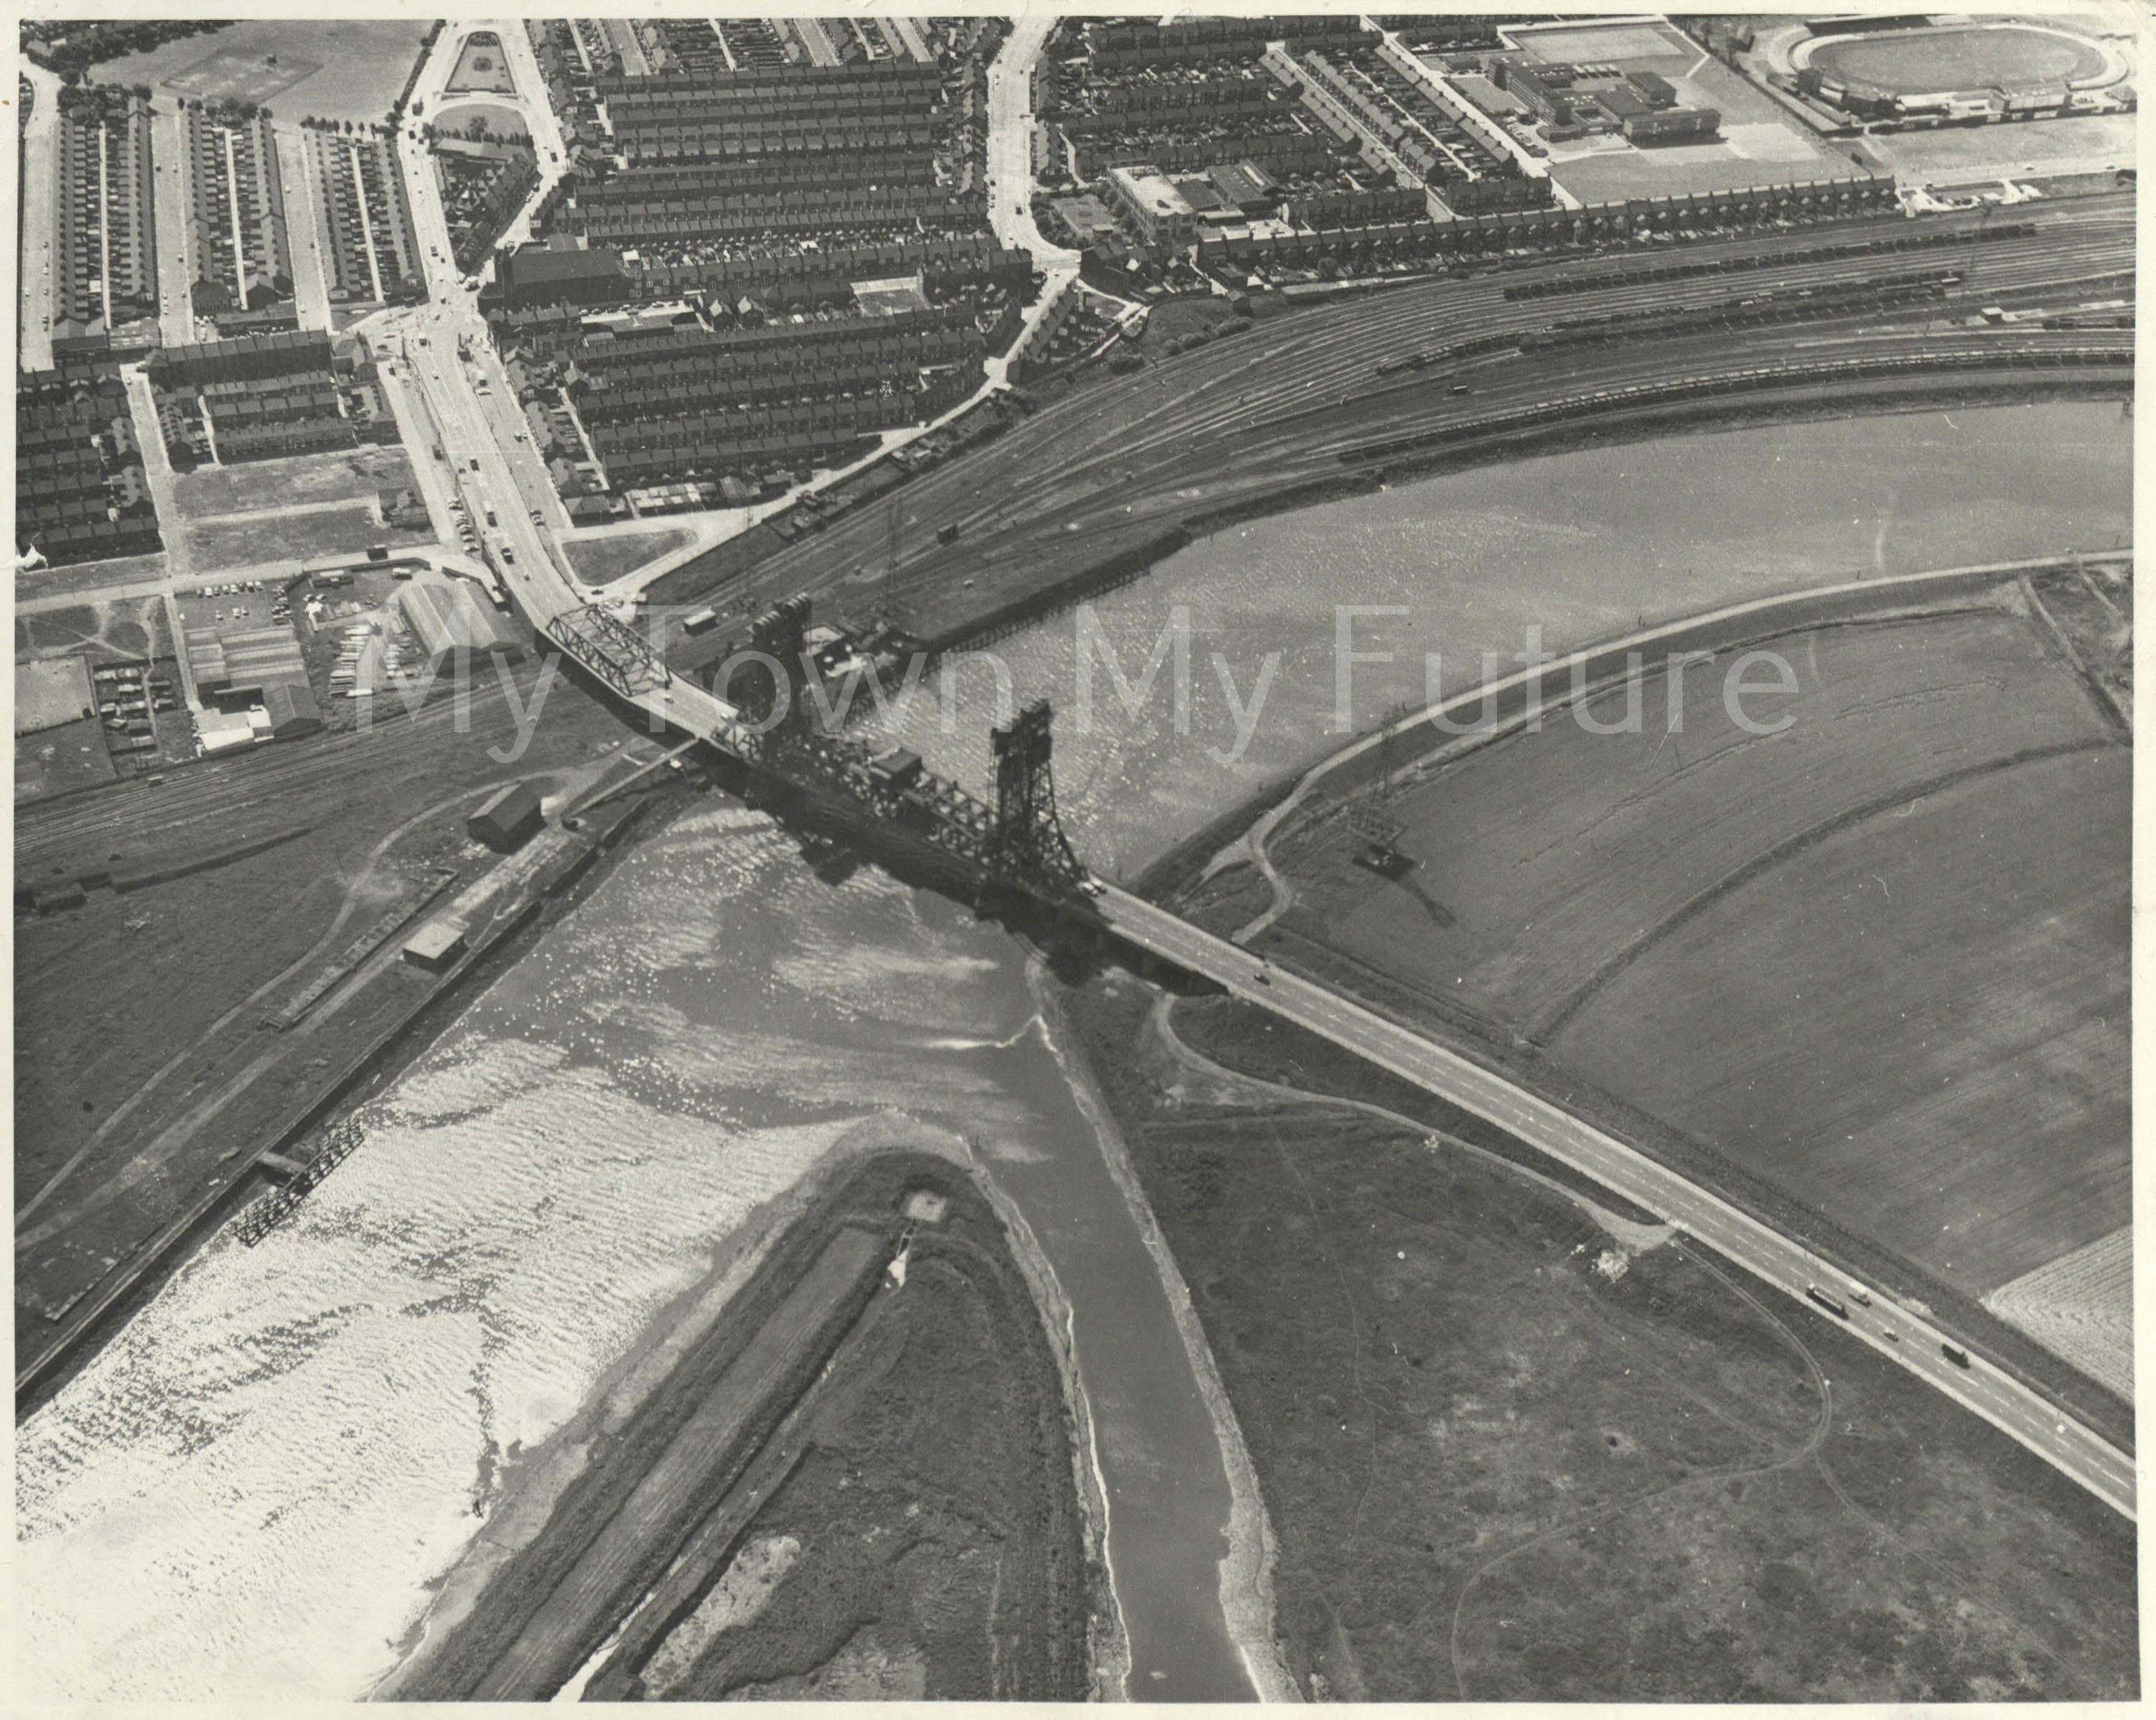 Newport Bridge, 1968 - Colin Simister